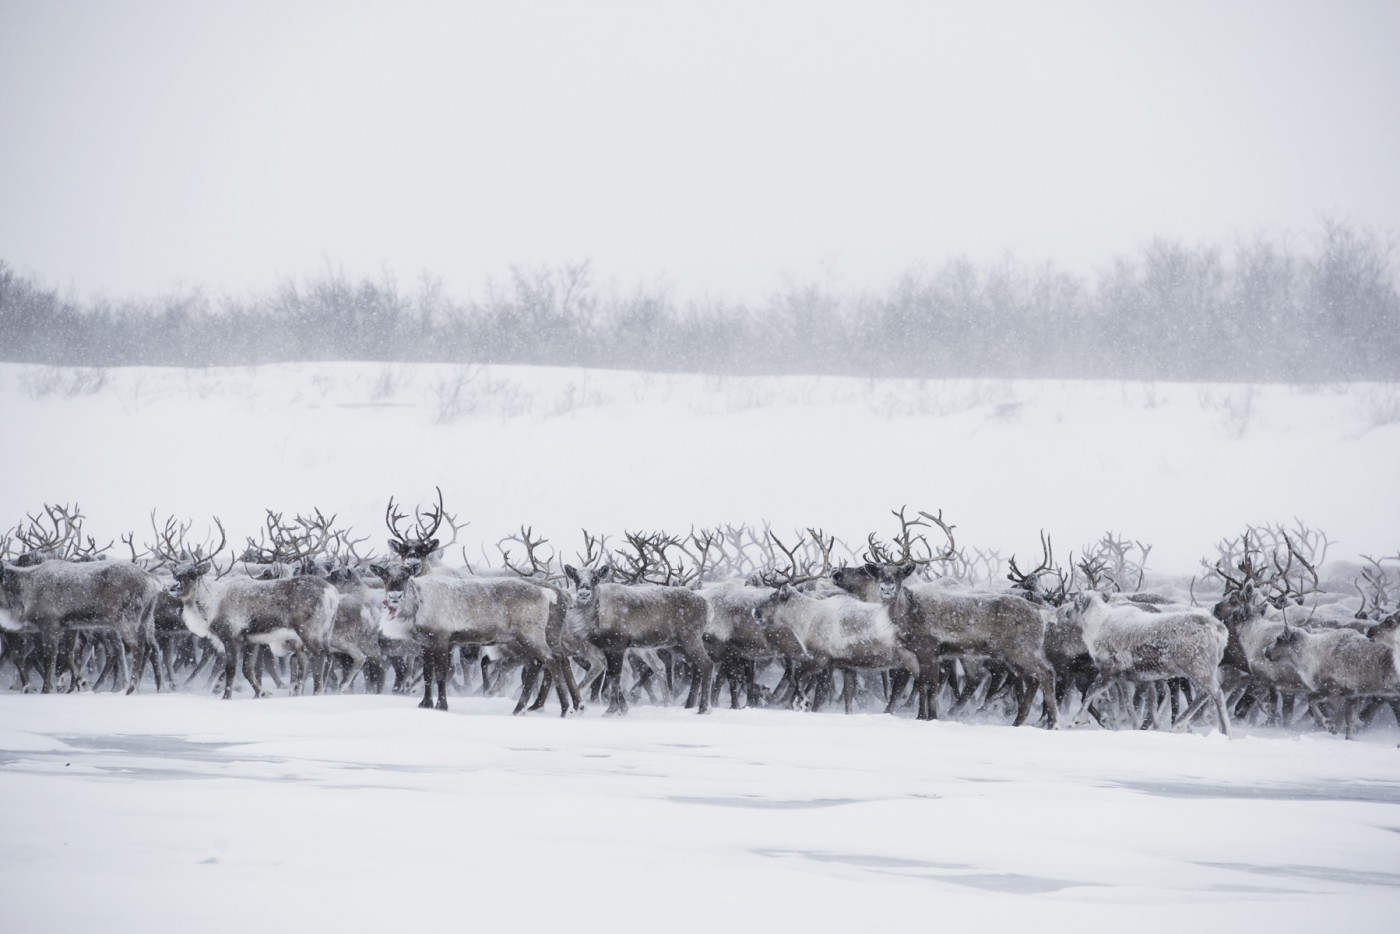 "Jason van Bruggen, </span><span><em>Reindeer Herd #4</em>, </span><span>2015. Chromogenic print, 40x60""."